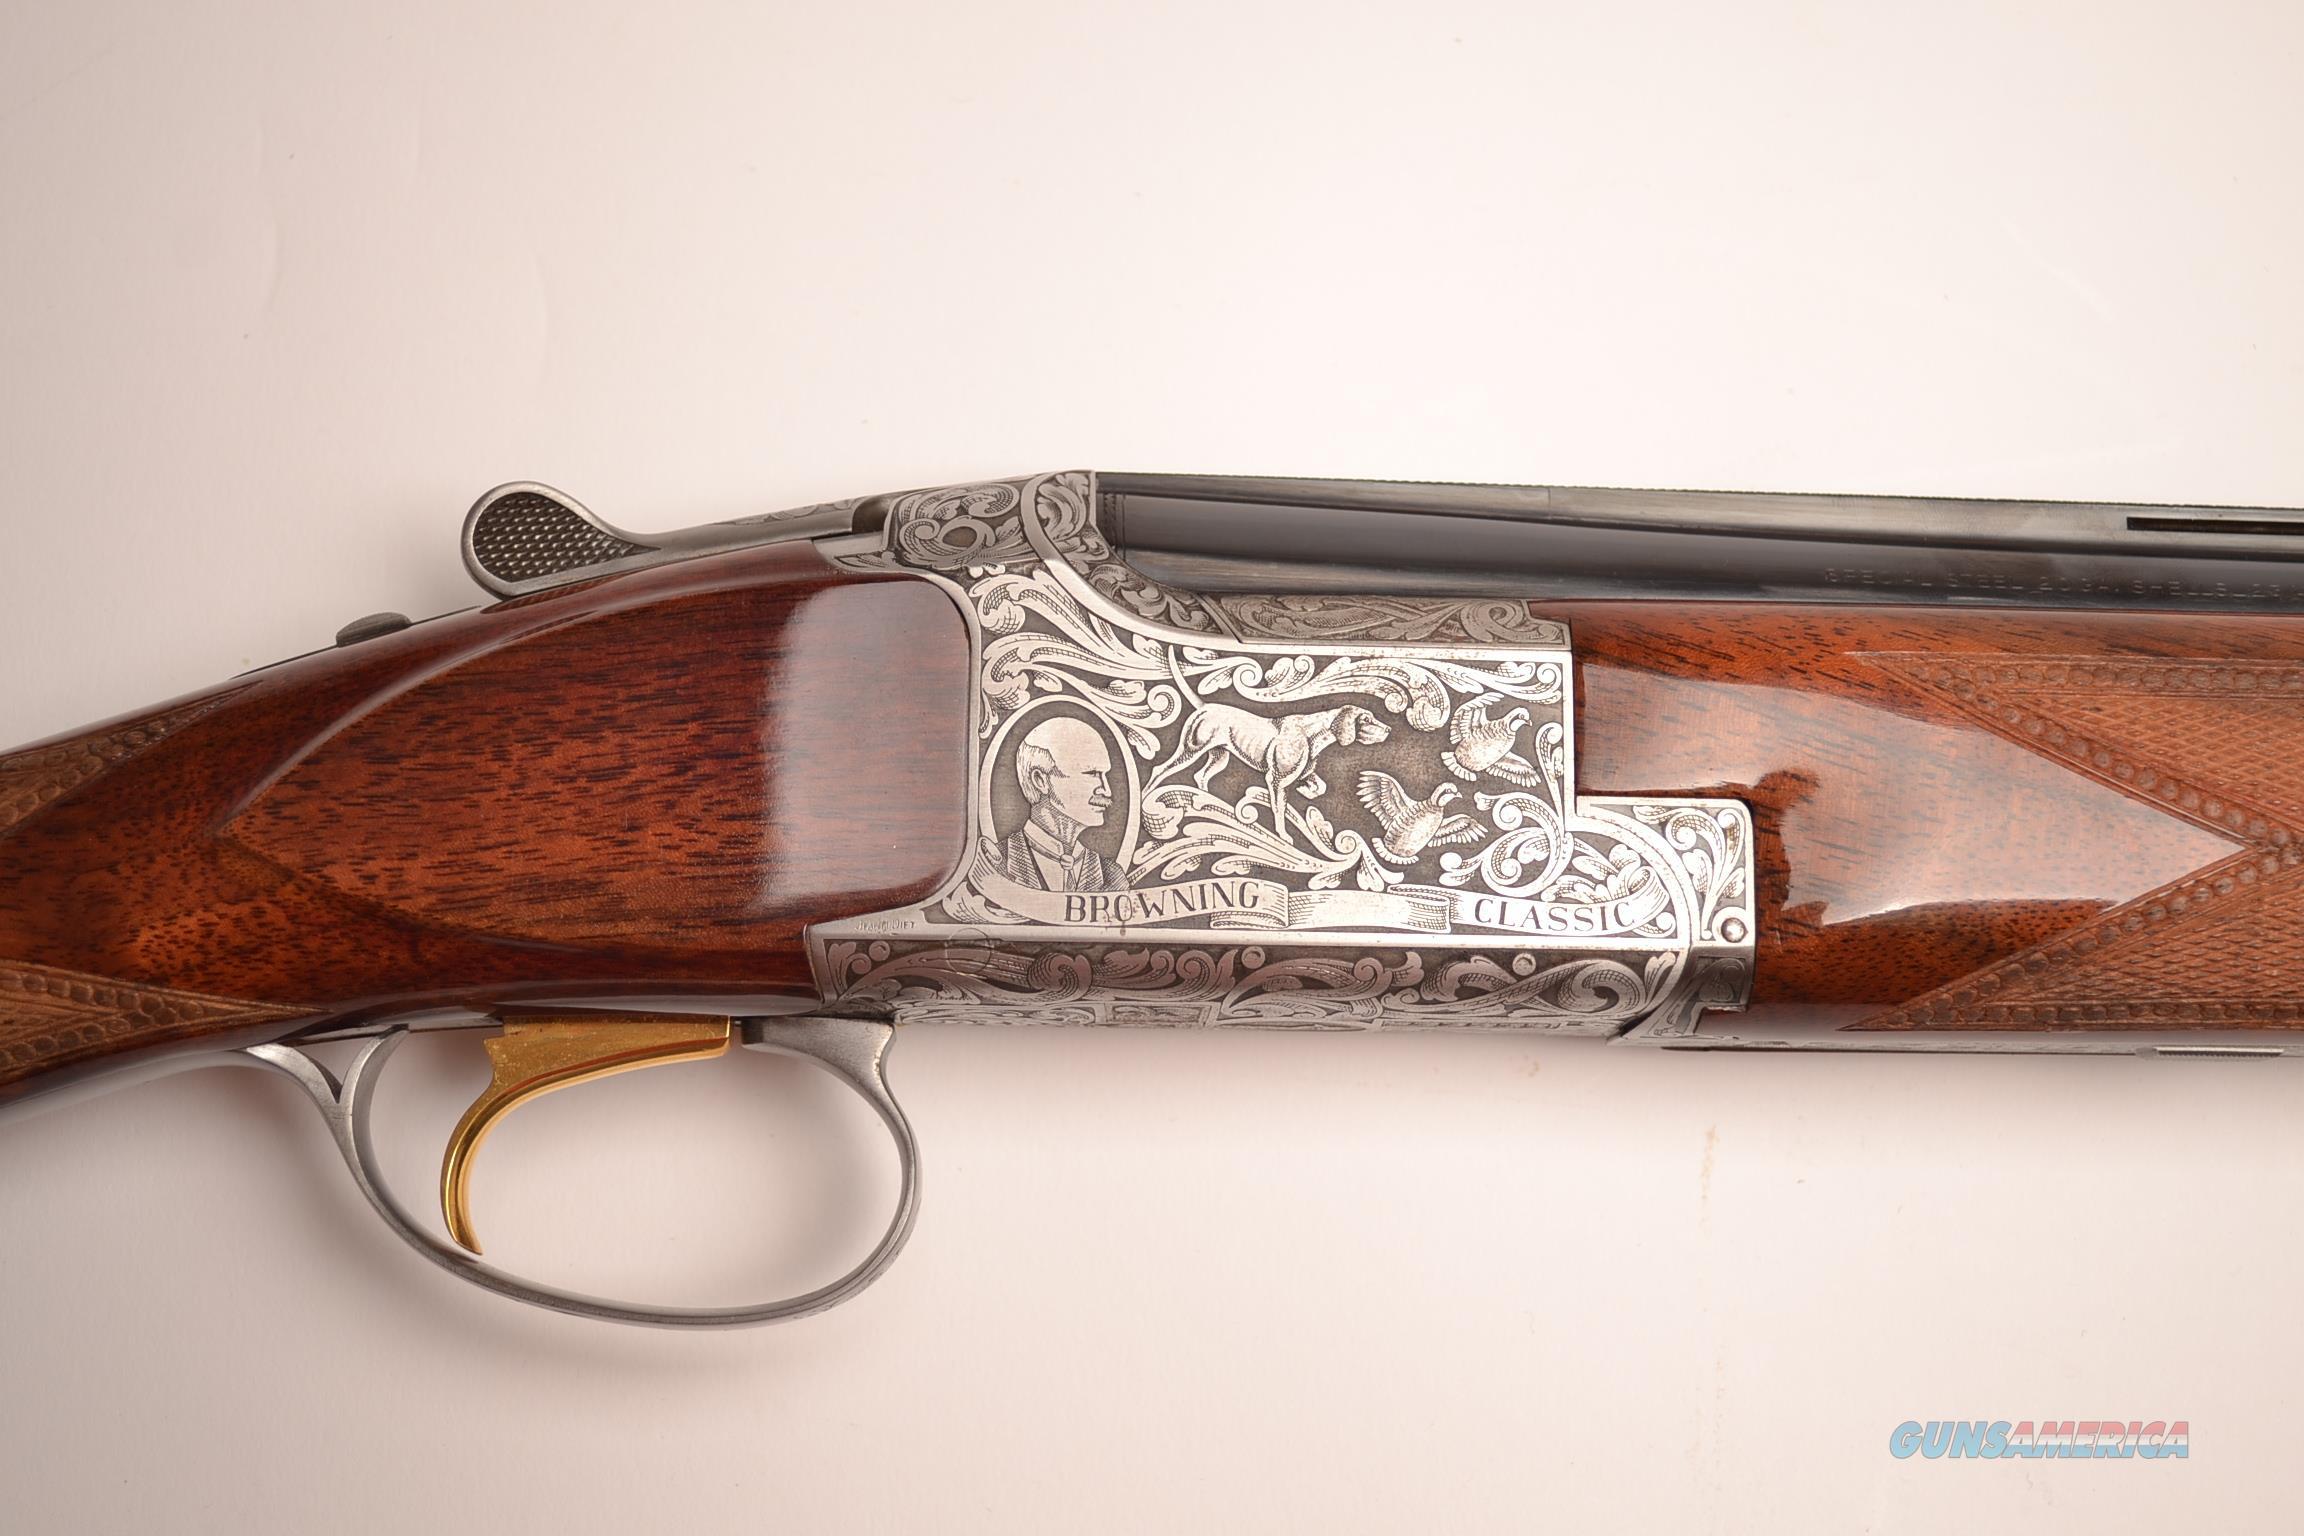 Browning - Classic Superlight  Guns > Shotguns > Browning Shotguns > Over Unders > Other OU > Hunting